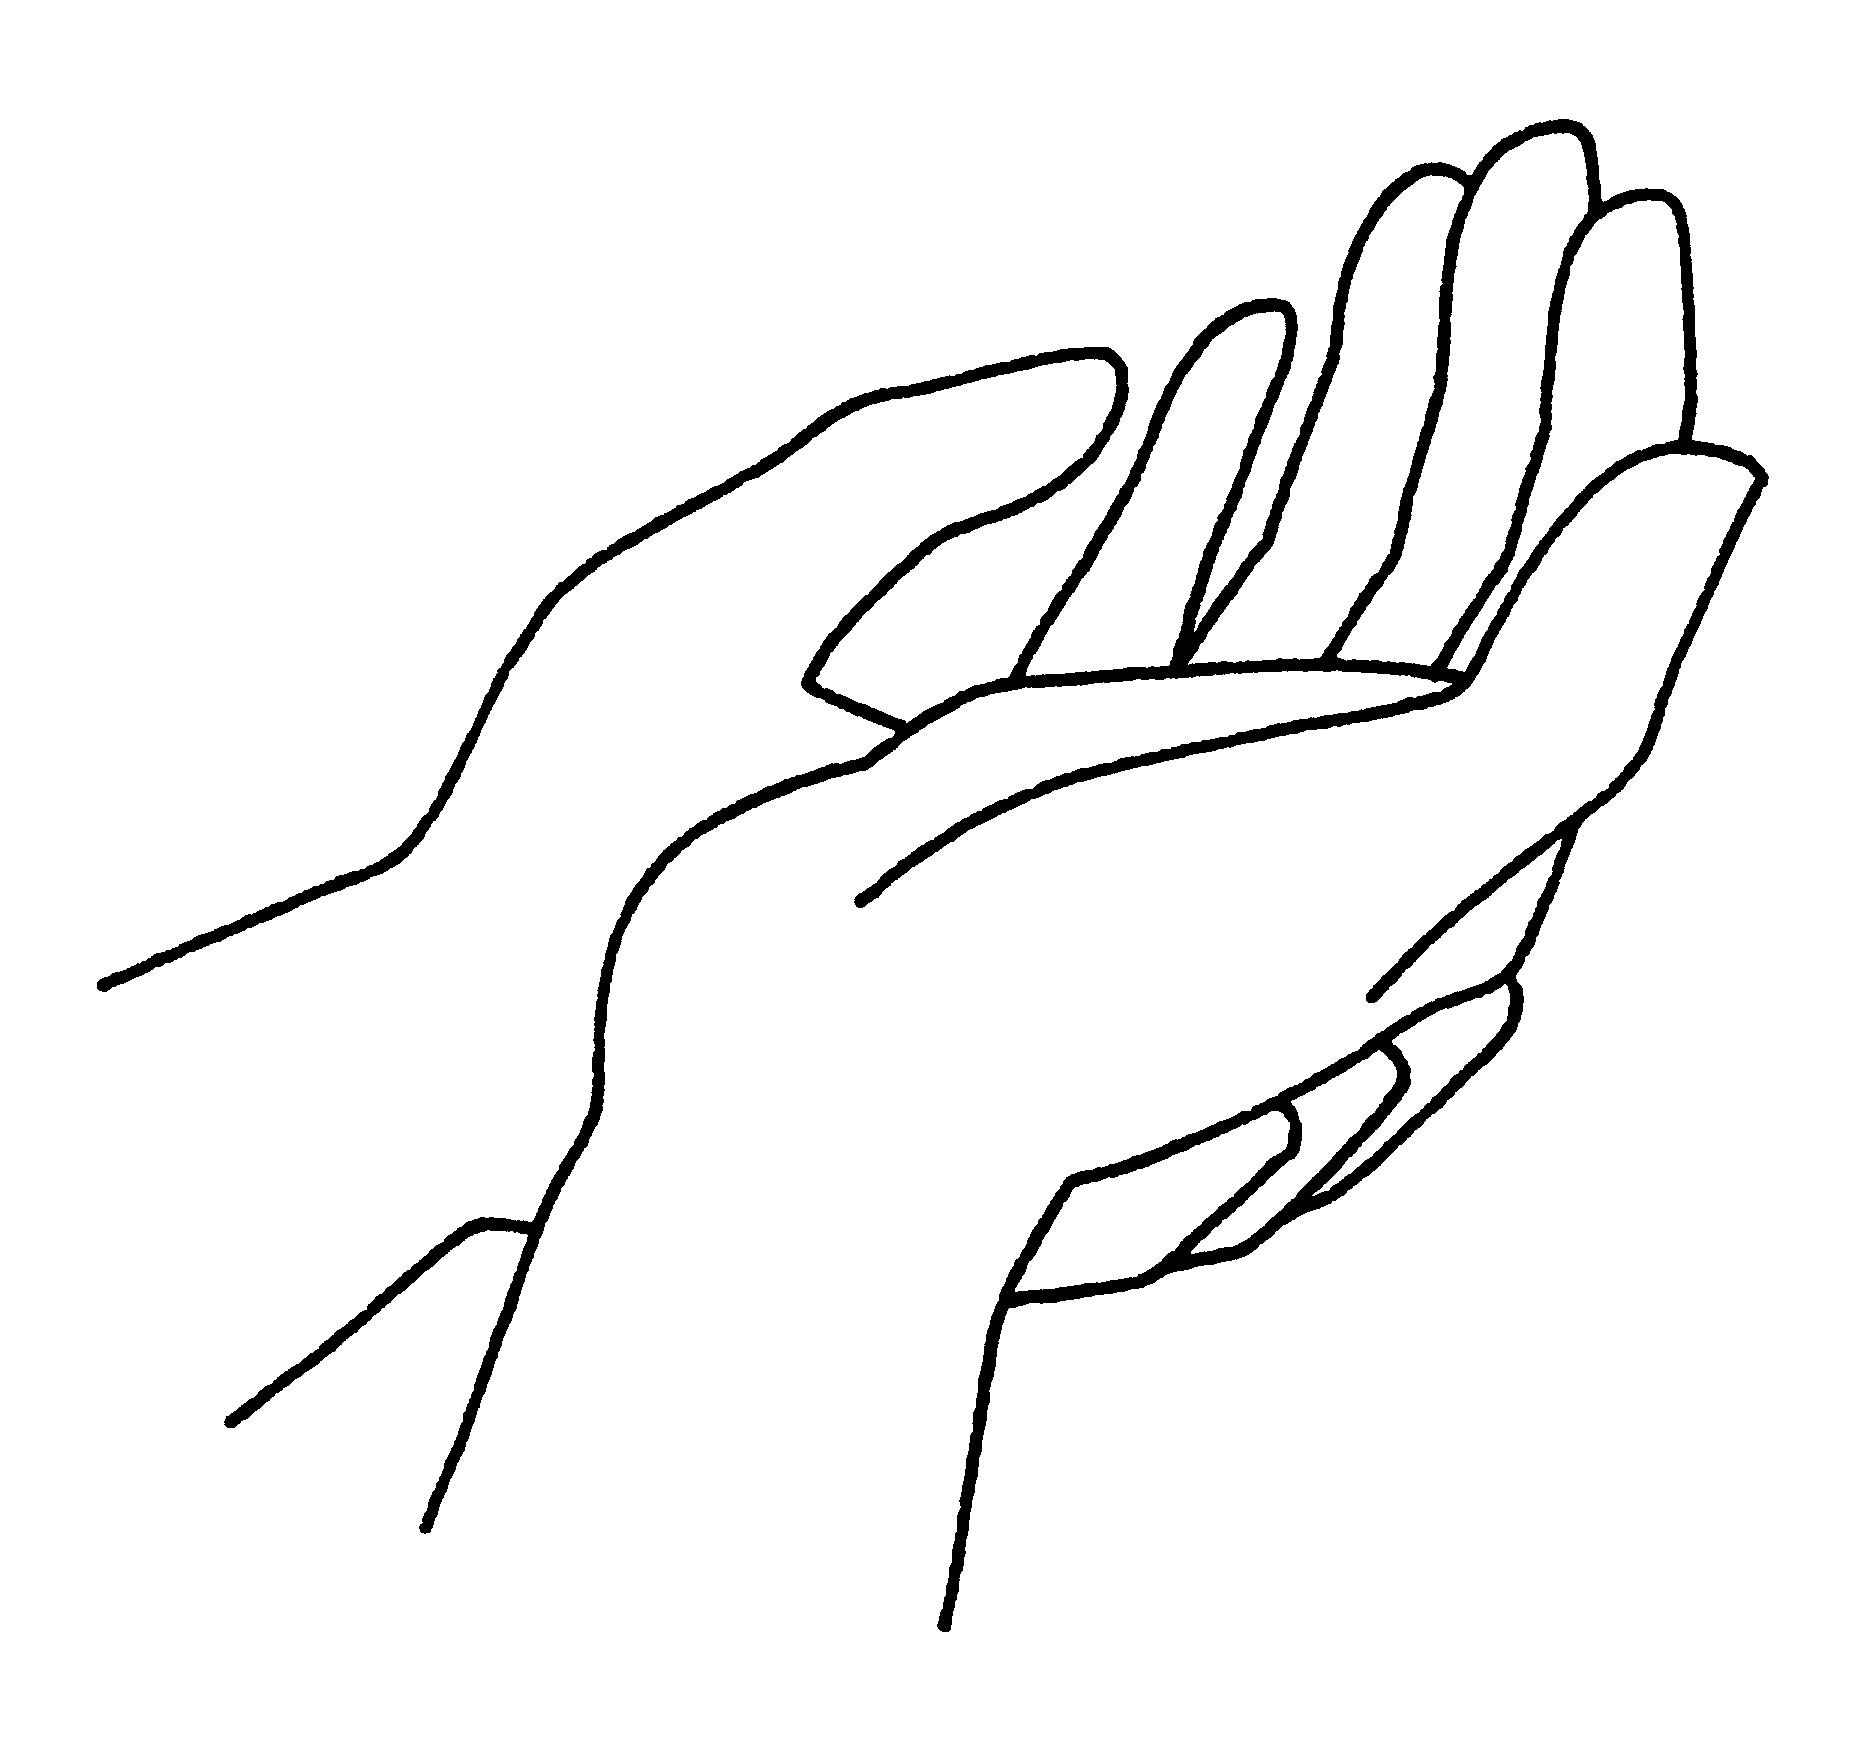 La terre appartient dieu potins divins - Dessin 2 mains ...